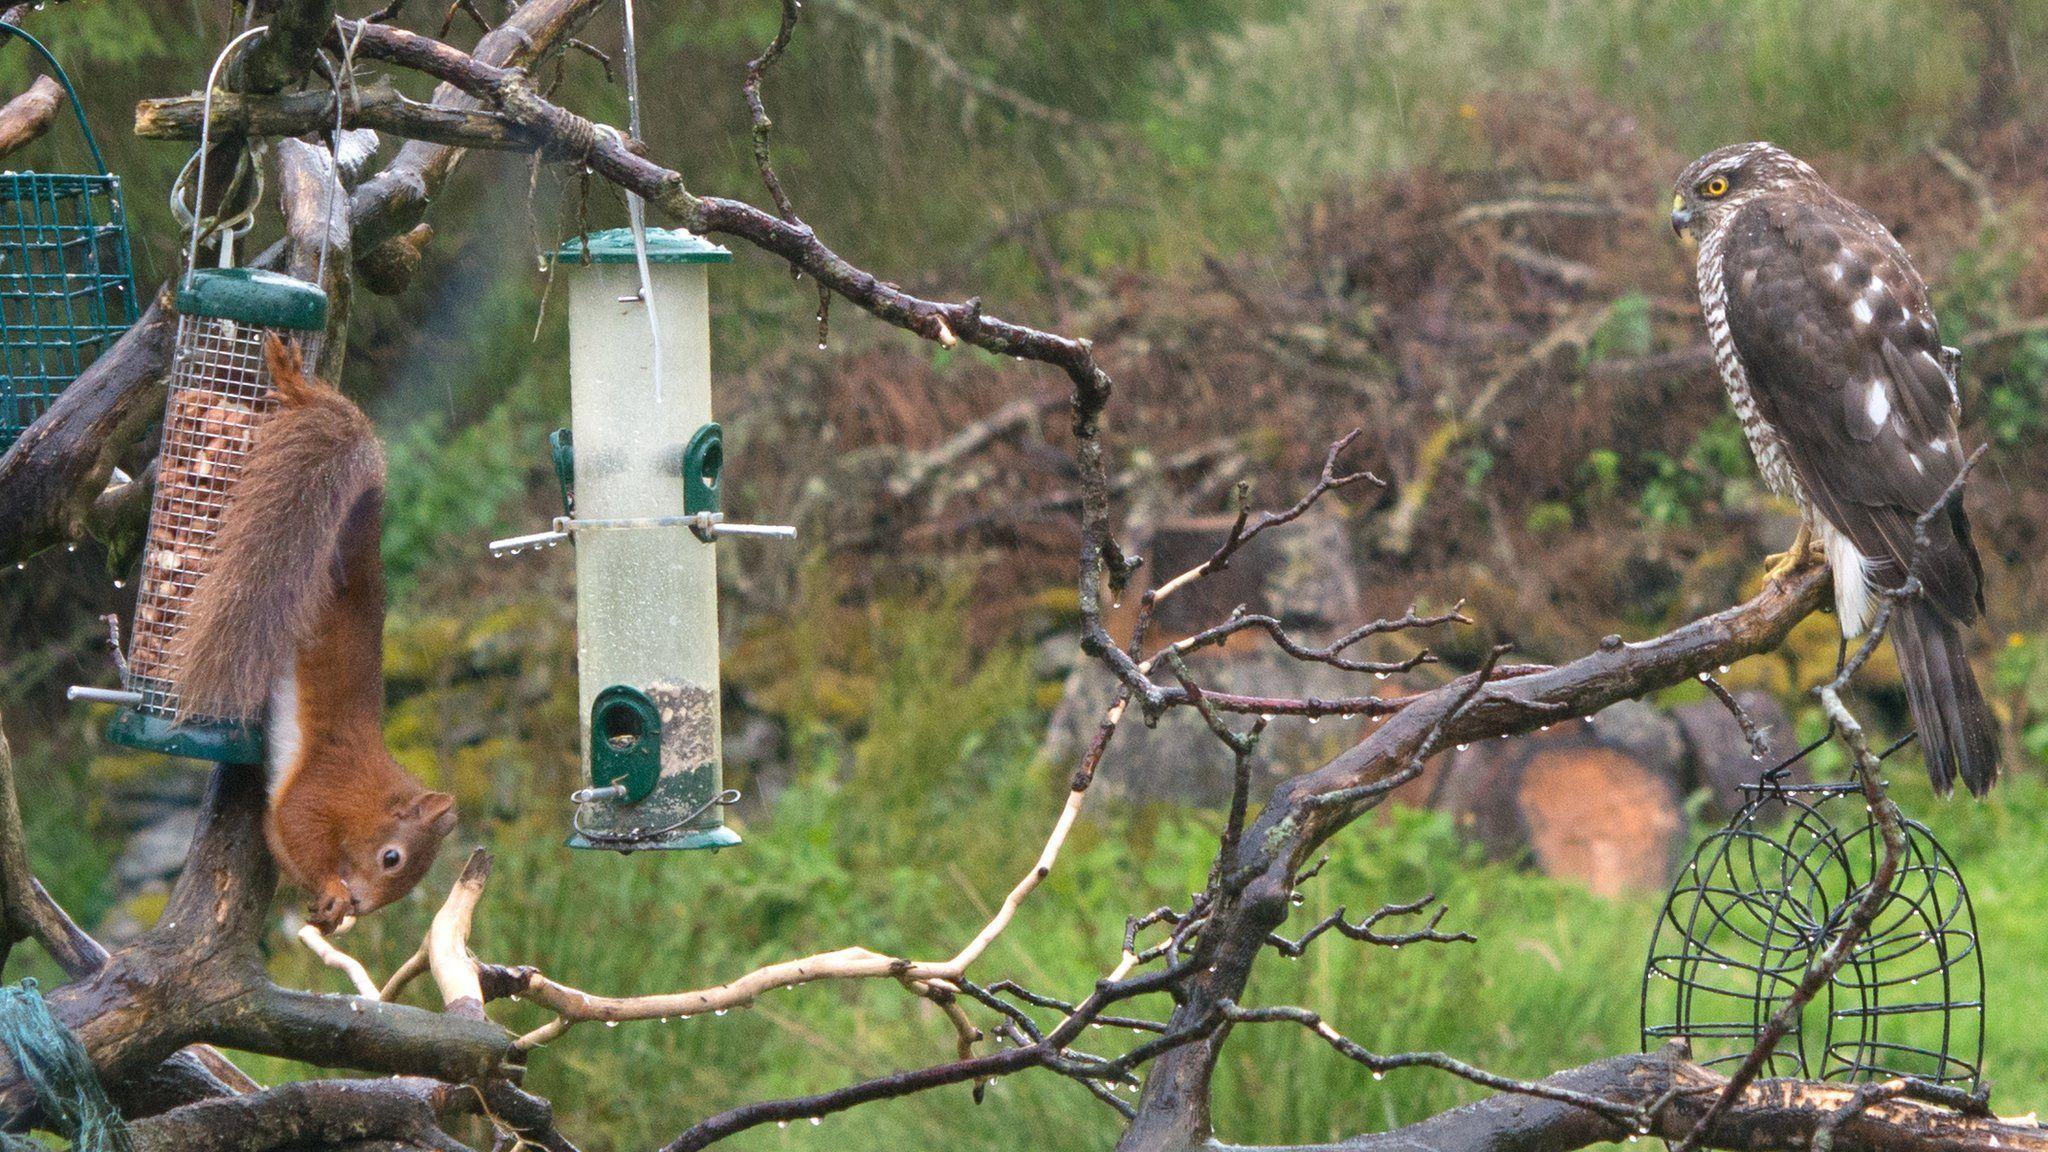 Squirrel versus sparrowhawk